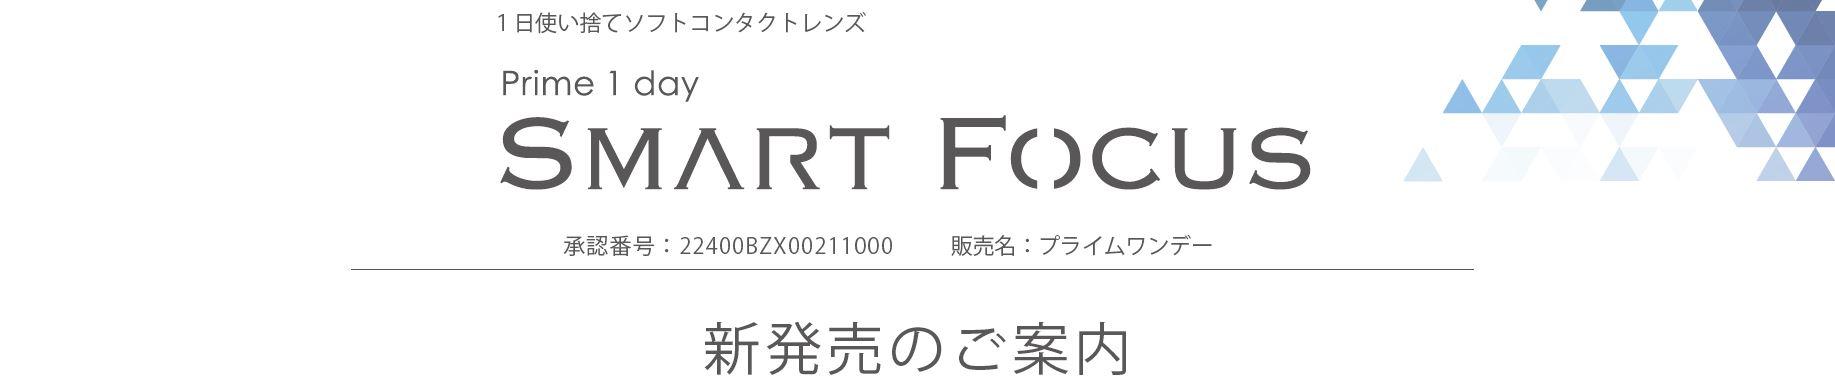 SmartFocus_head